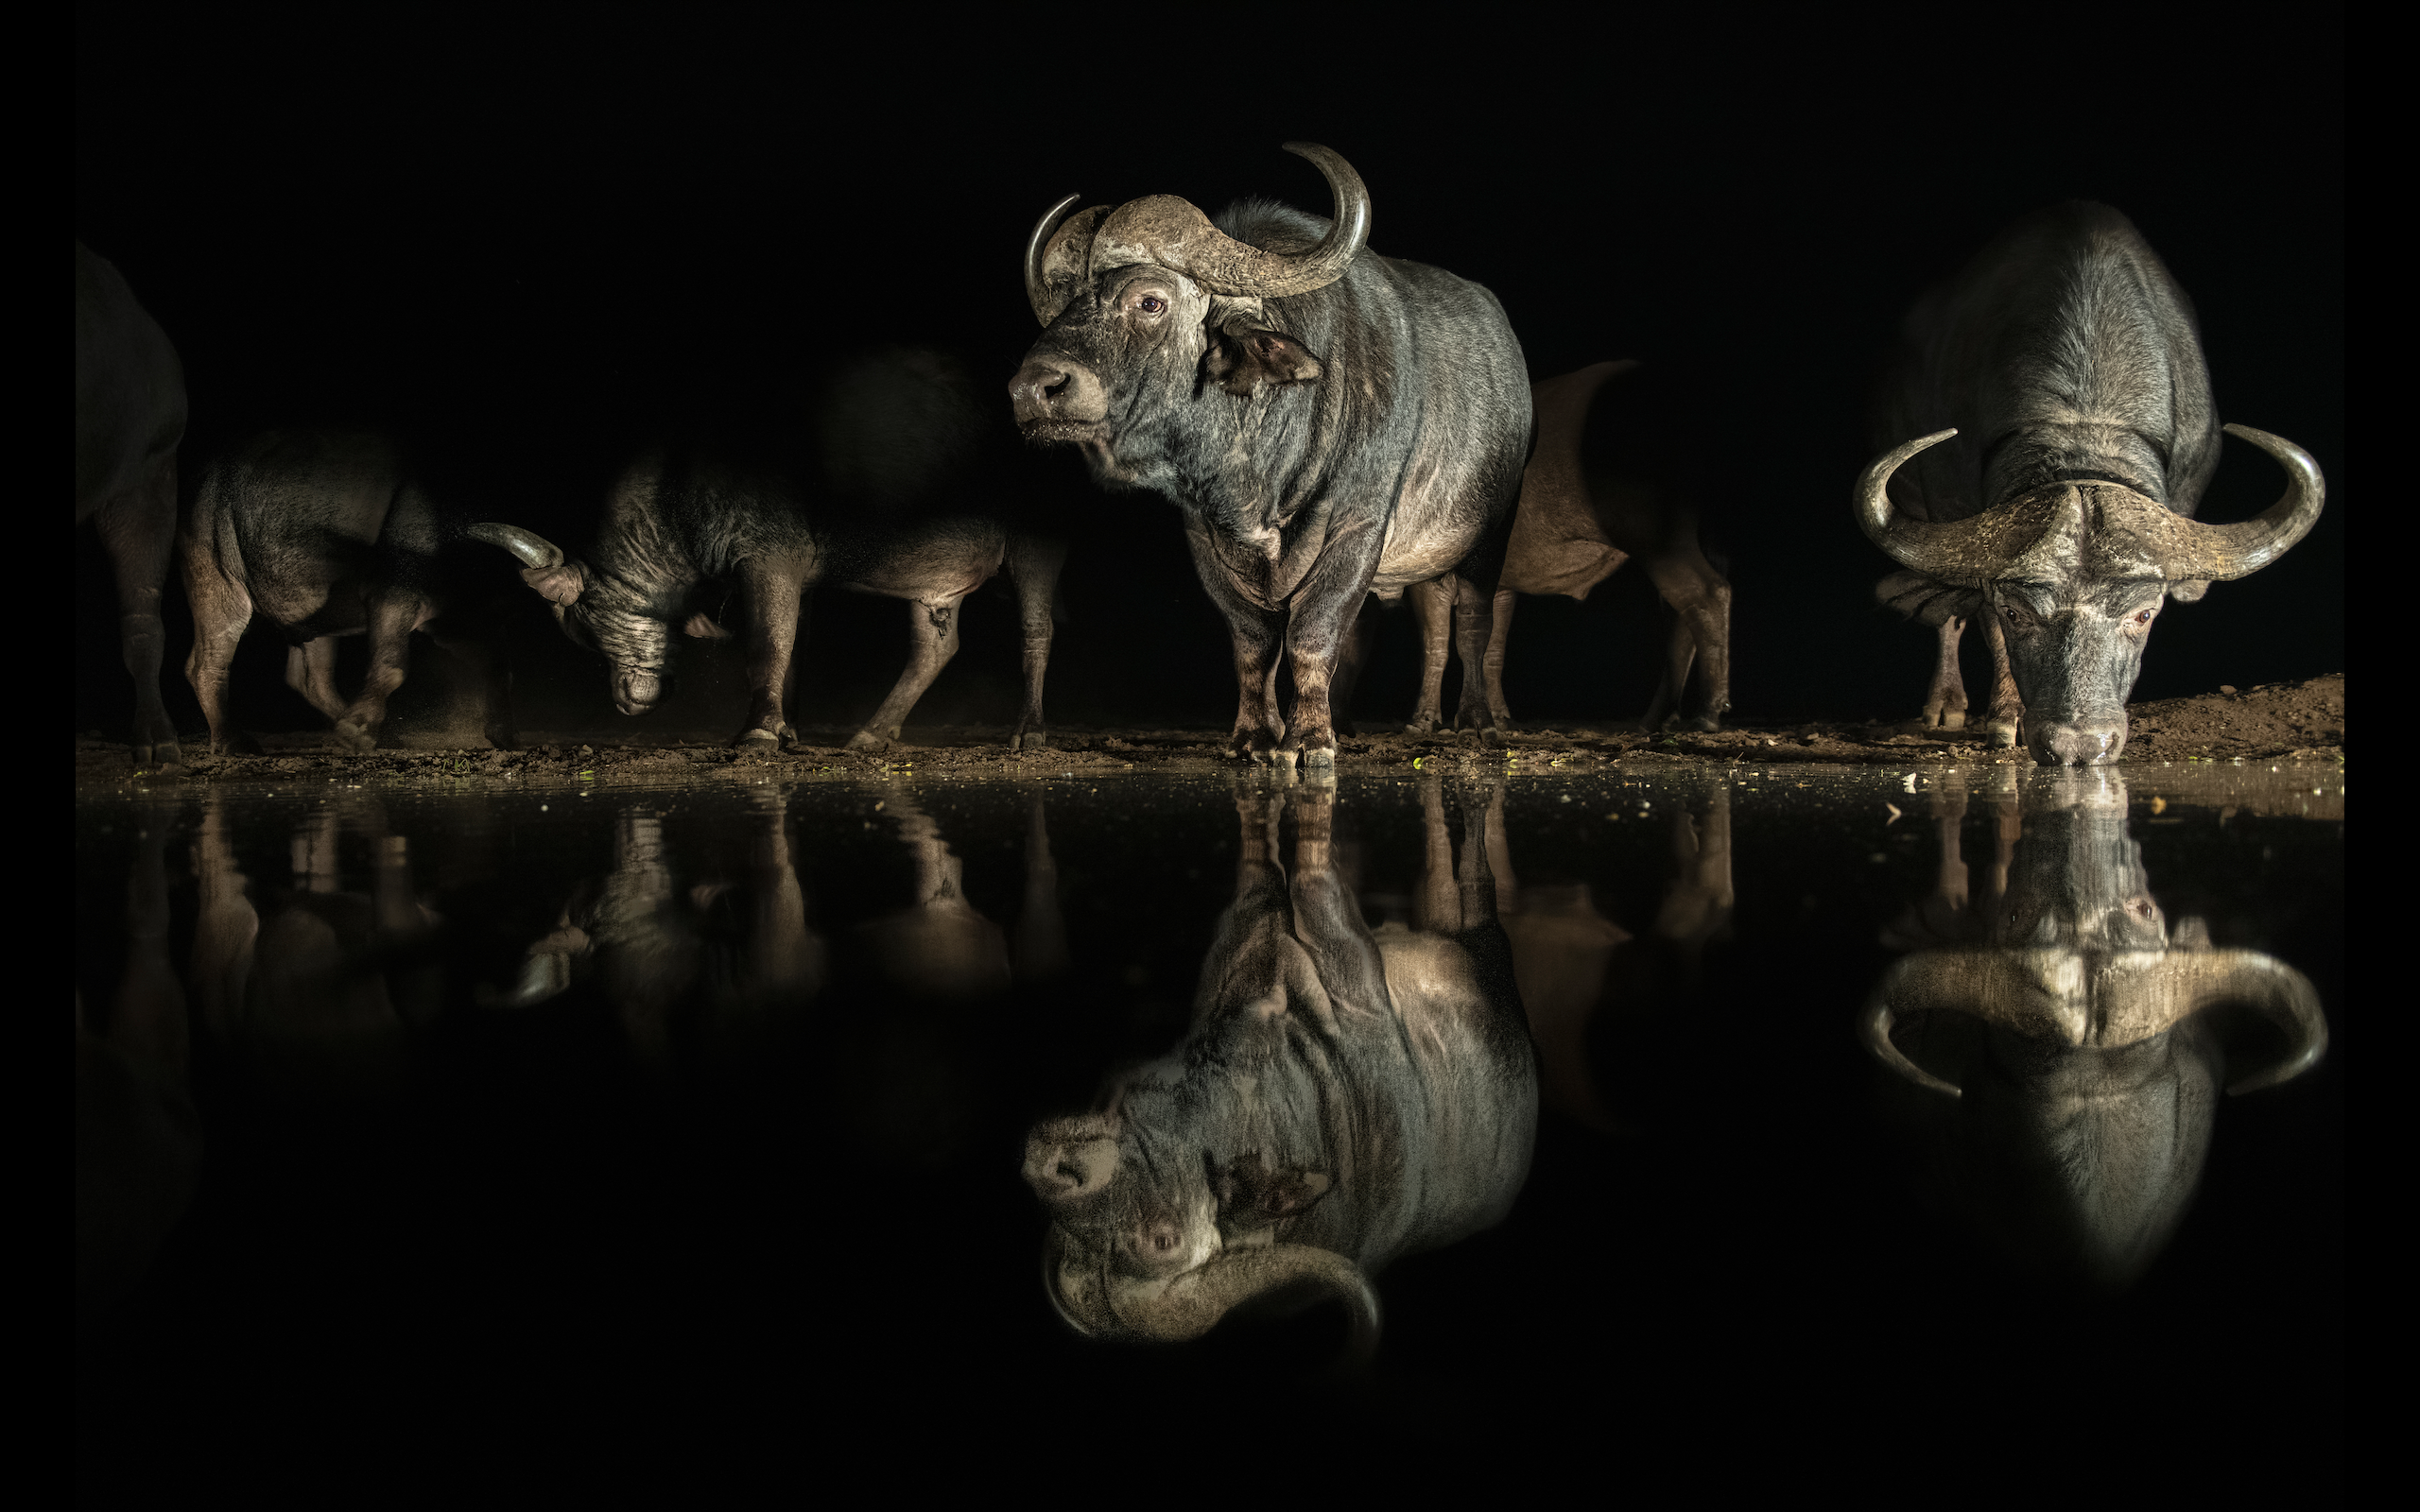 Dark Wall - The Thirstiest Buffalo